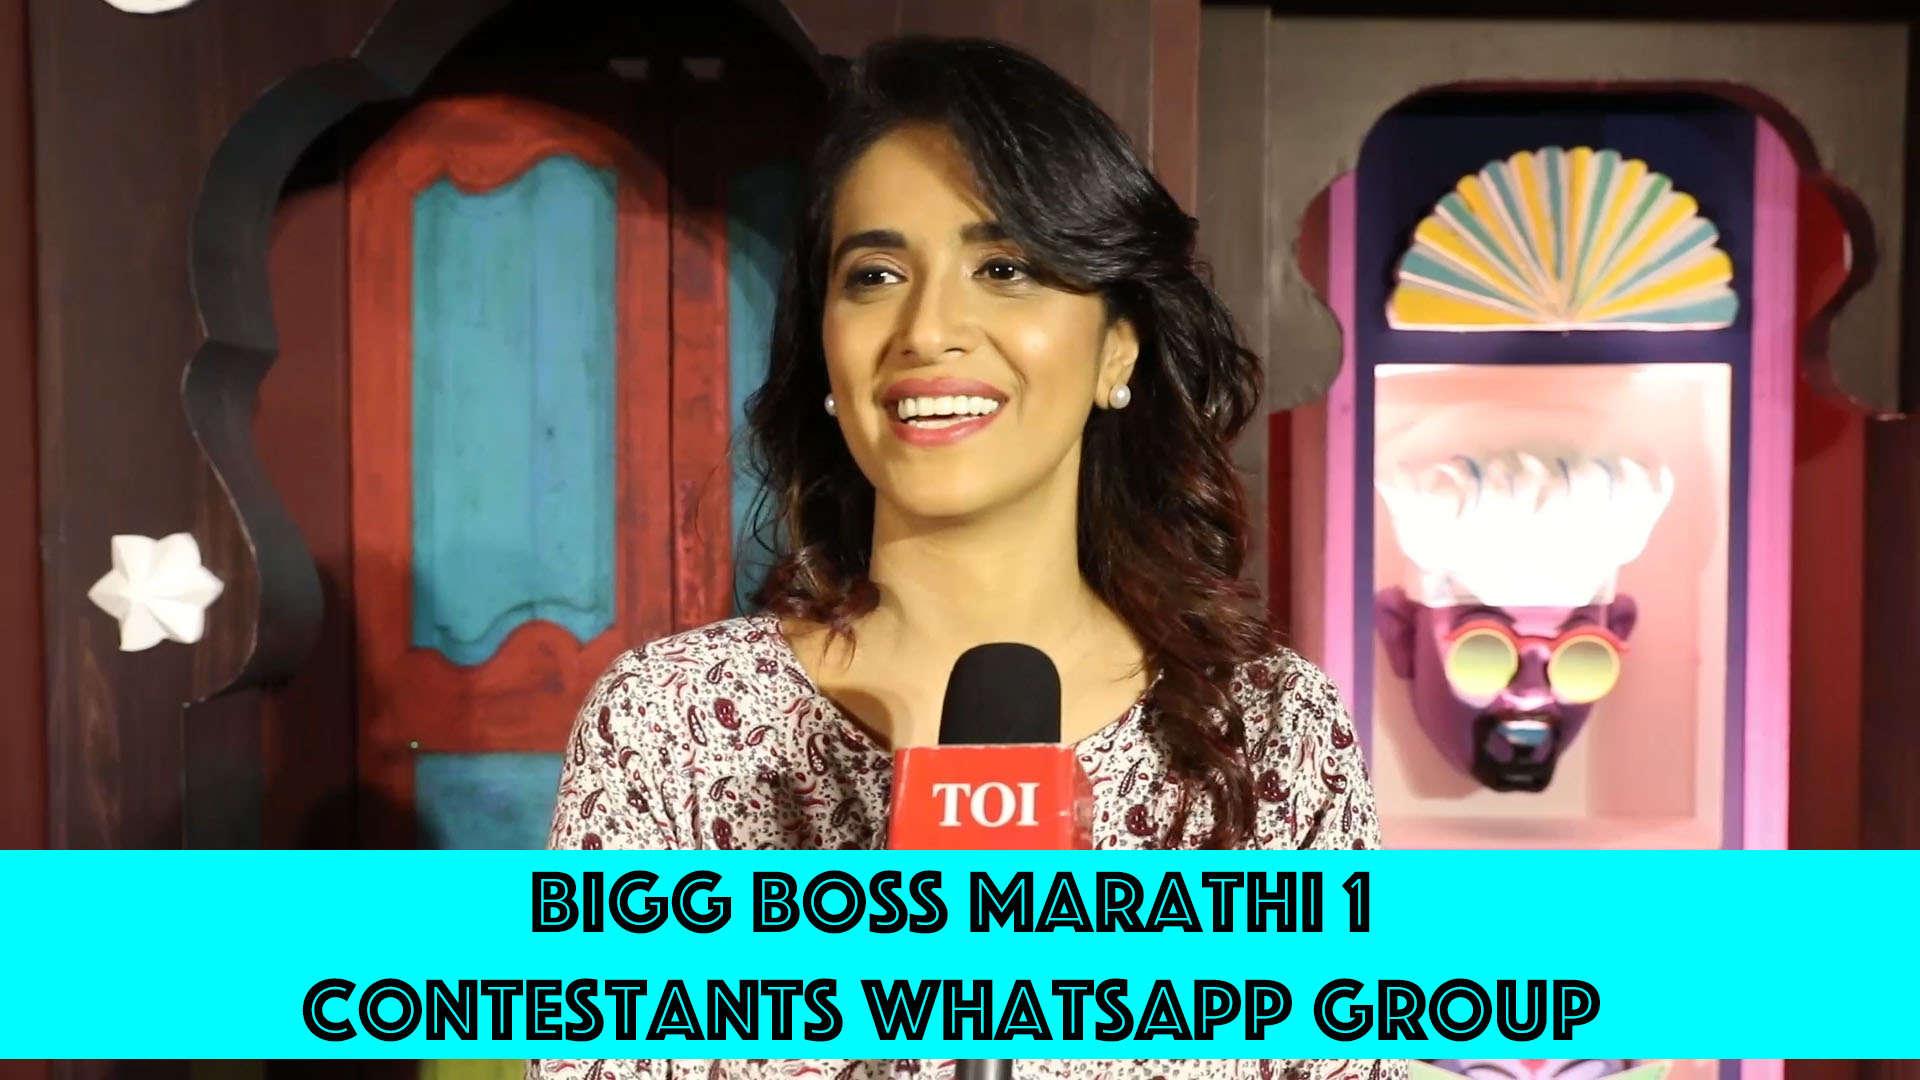 Sharmishtha Raut talks about the chat group of Bigg Boss Marathi 1  contestants